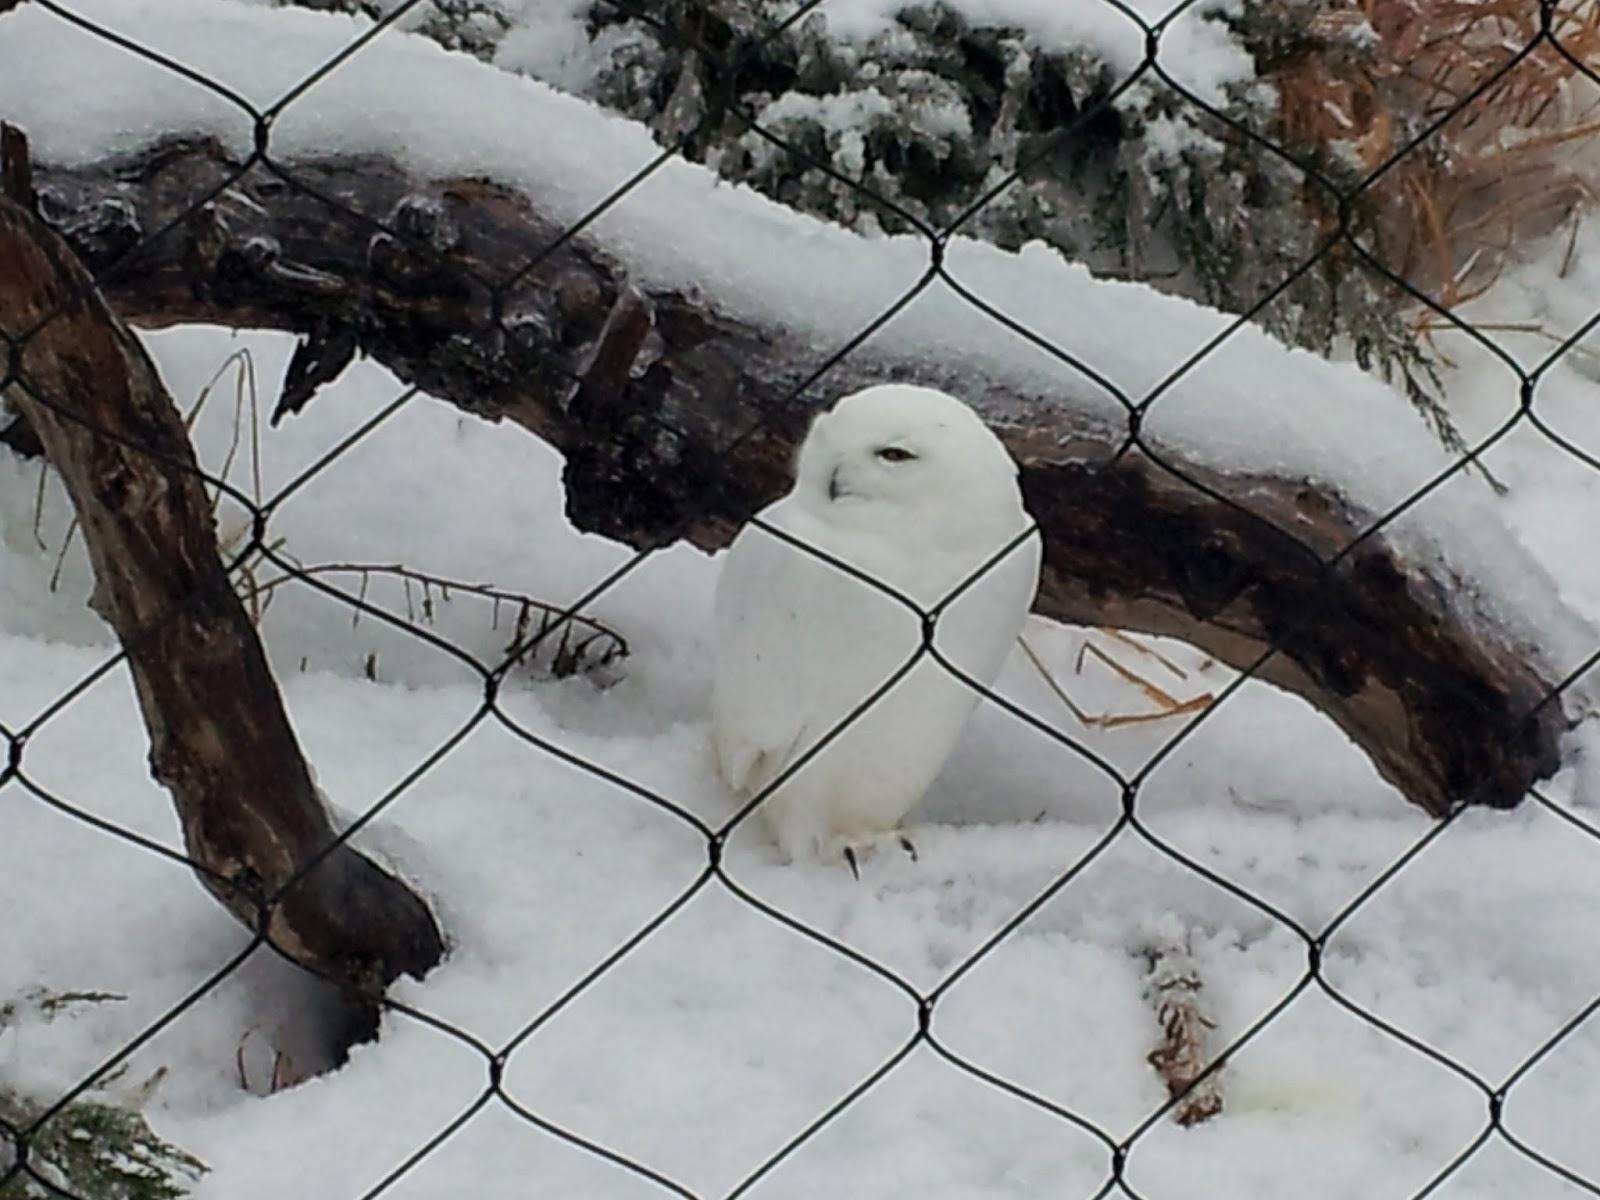 animals, zoo, winter, Canadian winter, animal photography